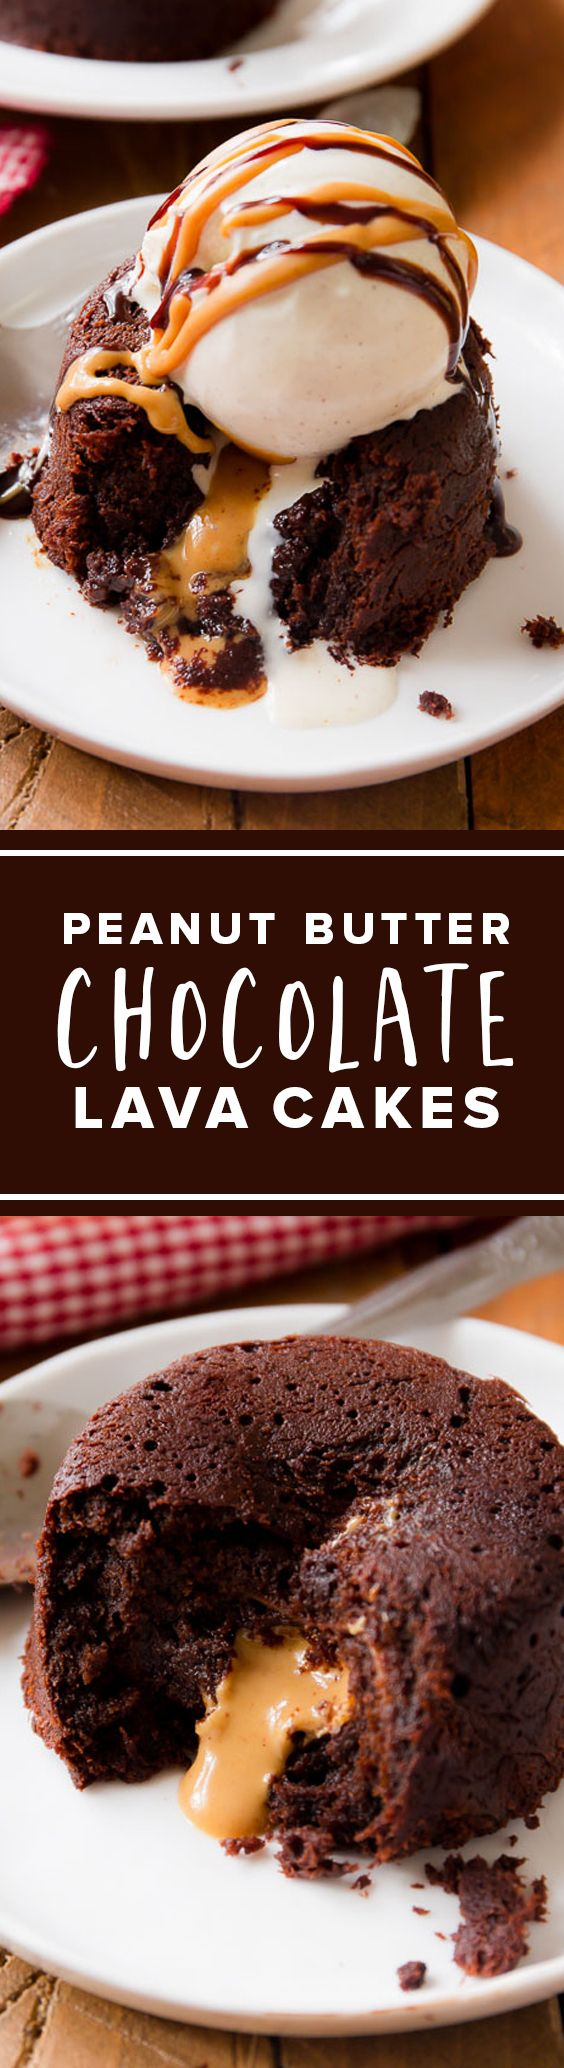 Chocolate lava cake pioneer woman